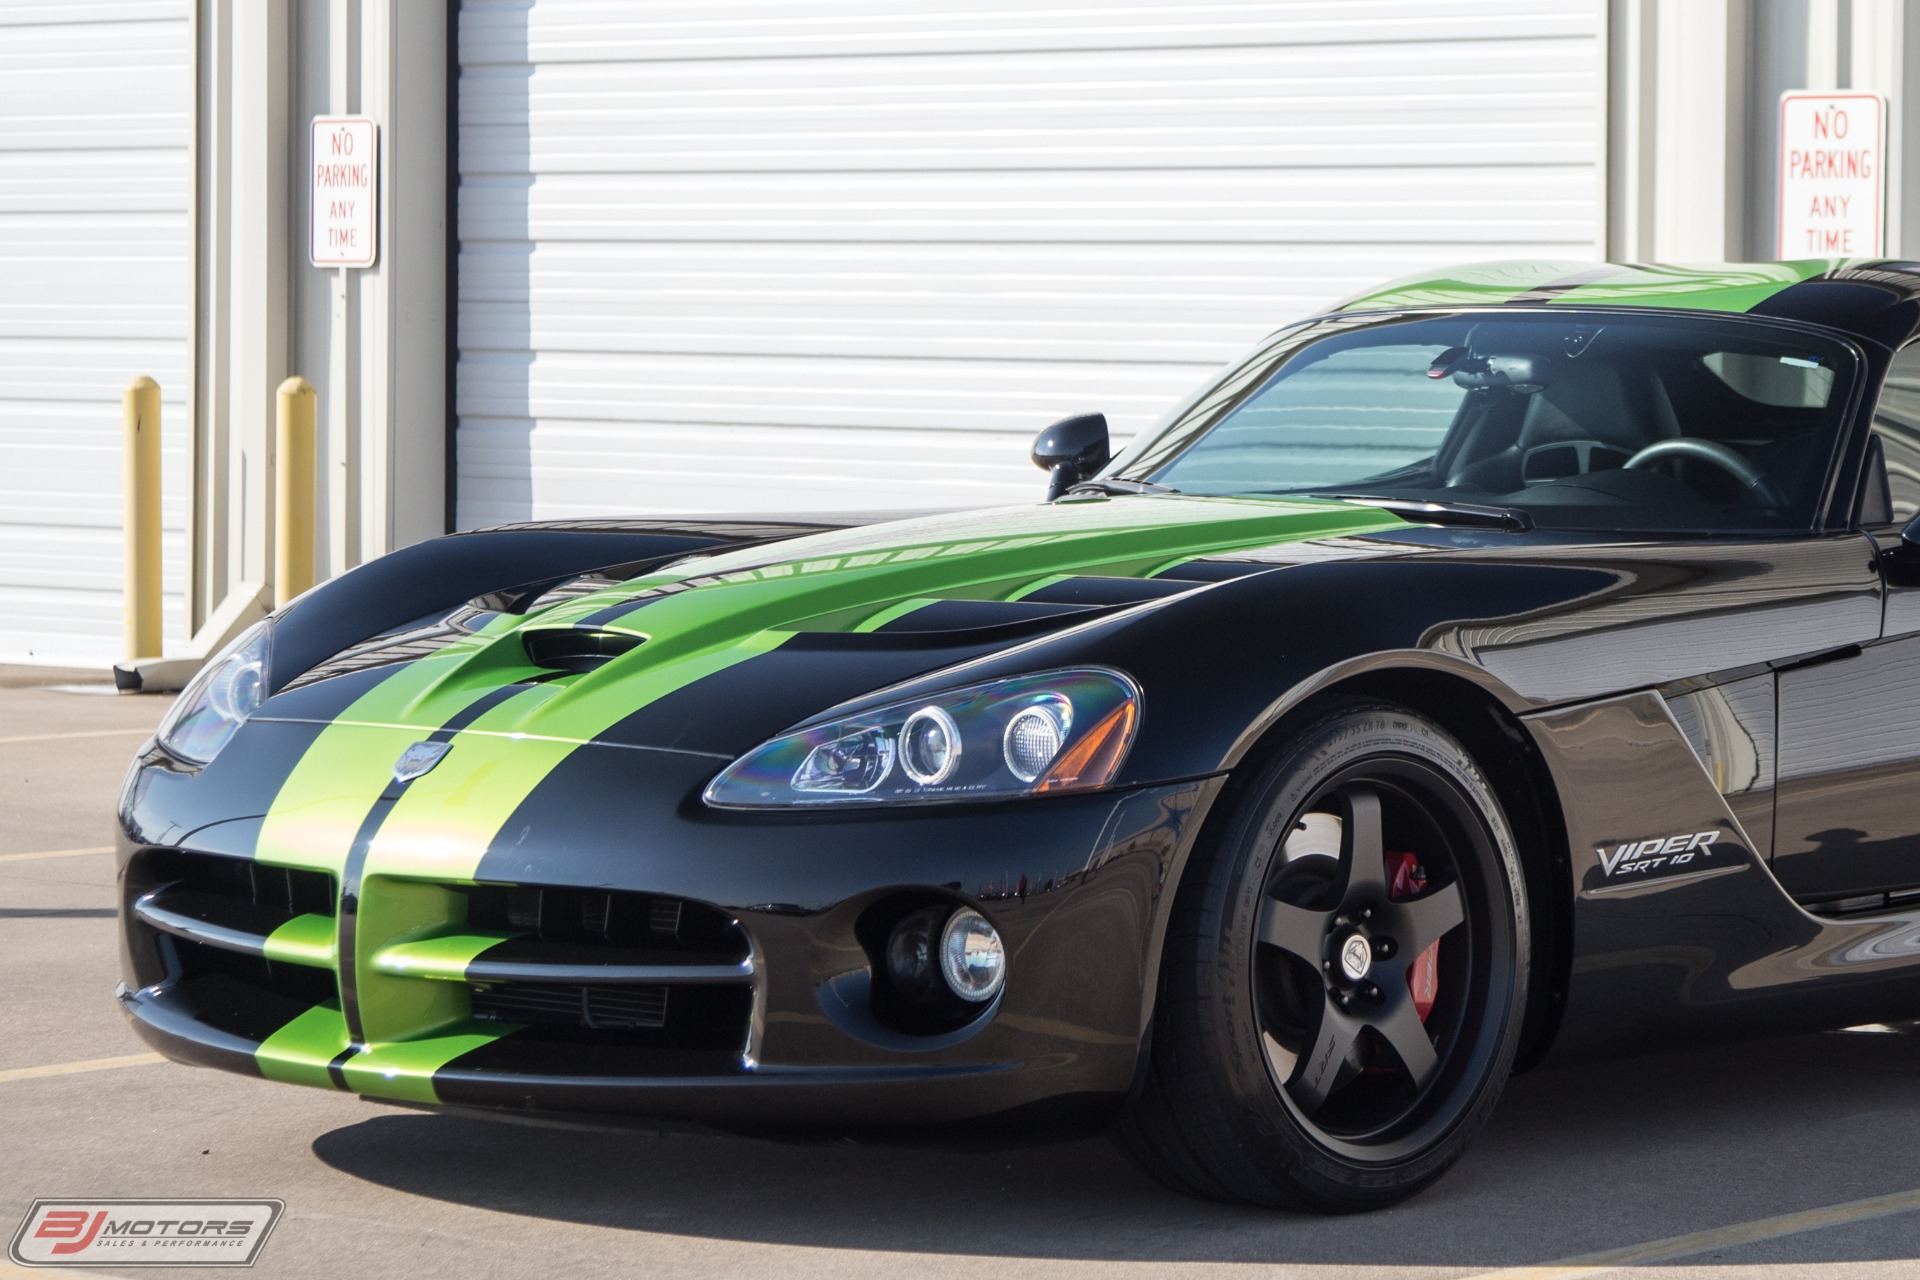 Used-2010-Dodge-Viper-SRT-10